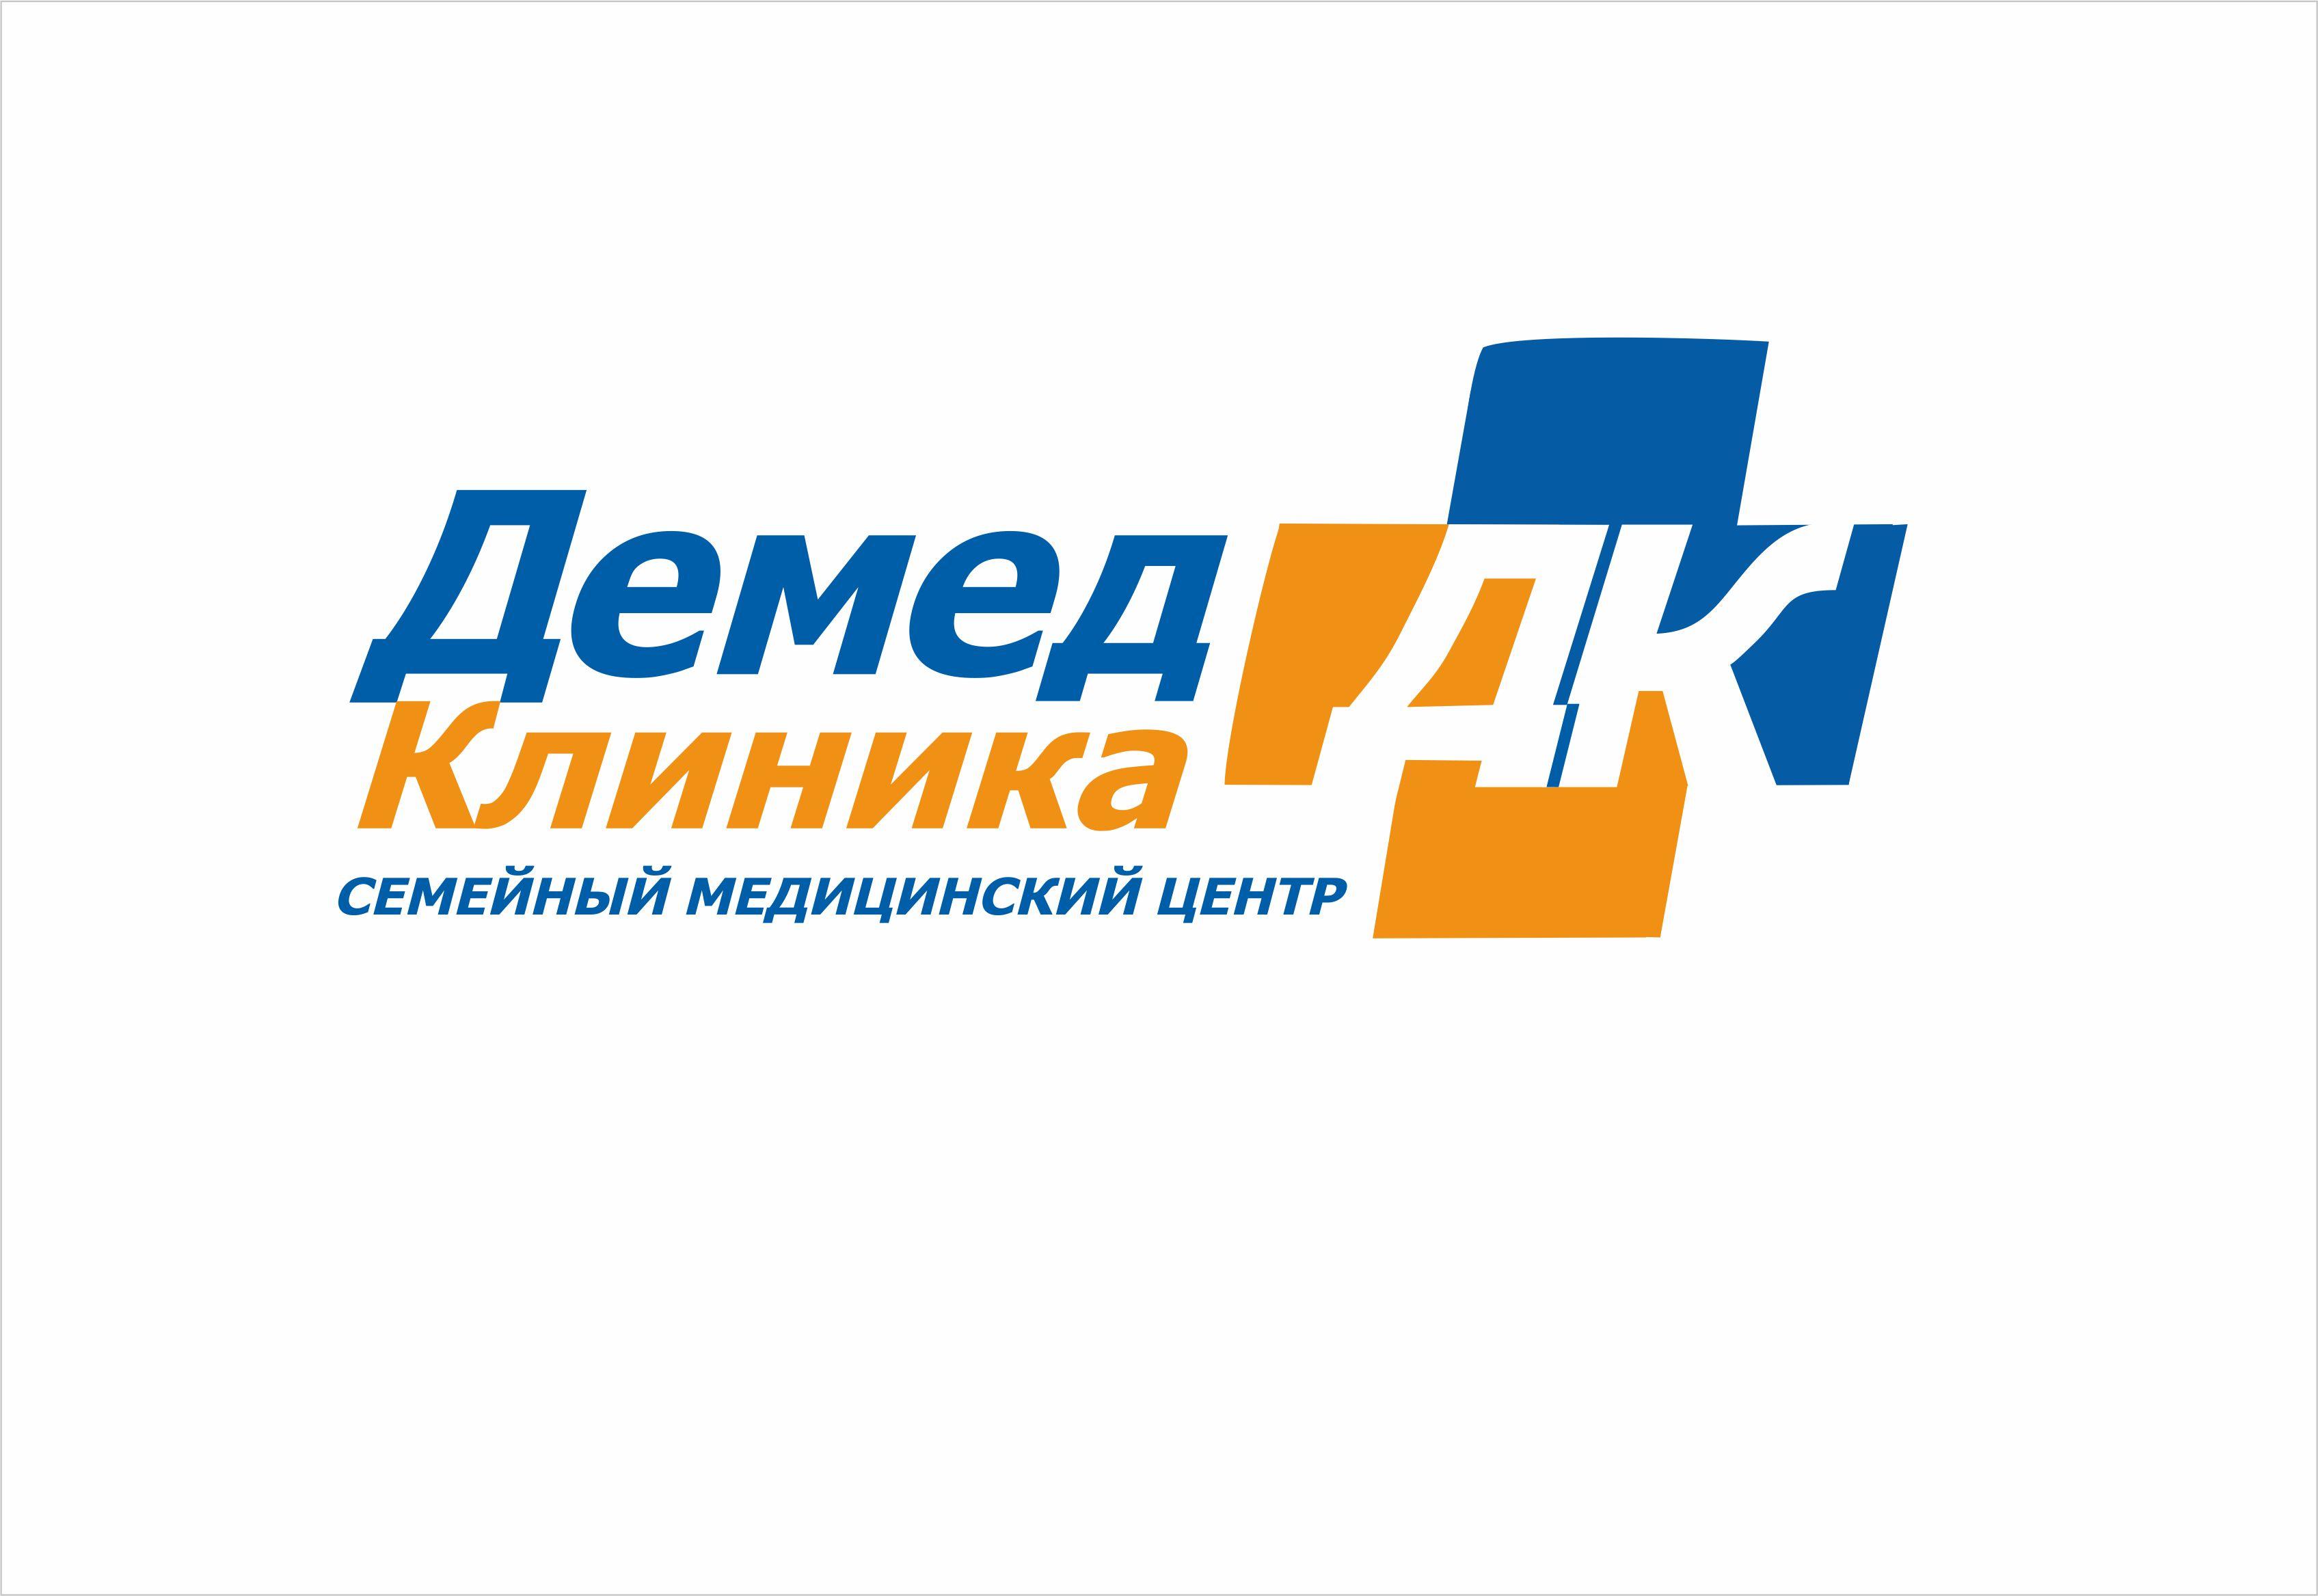 Логотип медицинского центра фото f_8625dce4850919a1.jpg